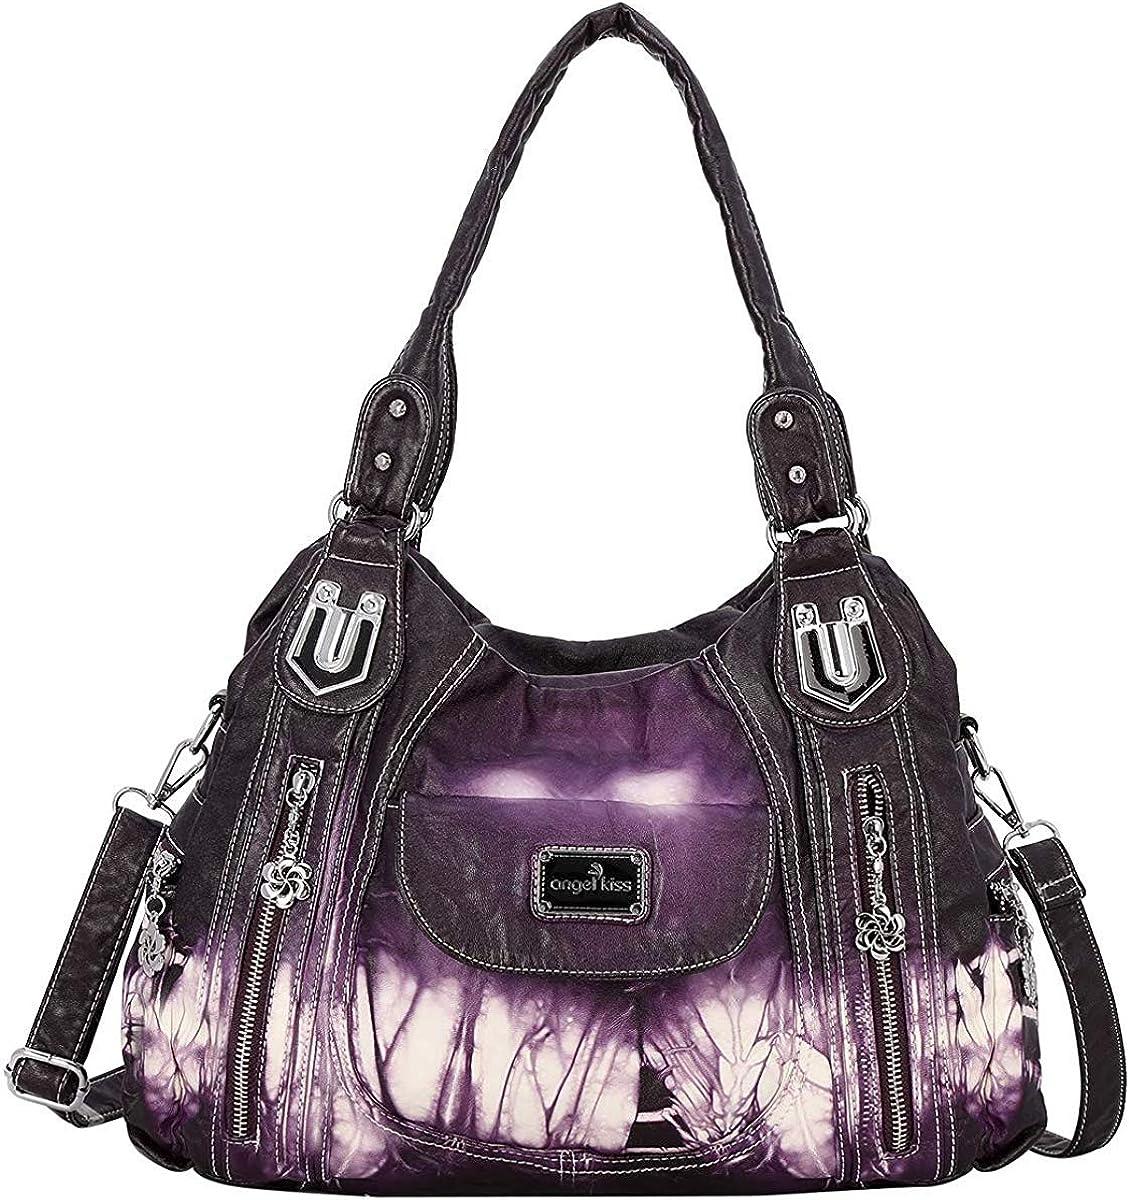 Handbag Hobo Women Sale Bag Roomy Pockets Street half ladies' Multiple Sho